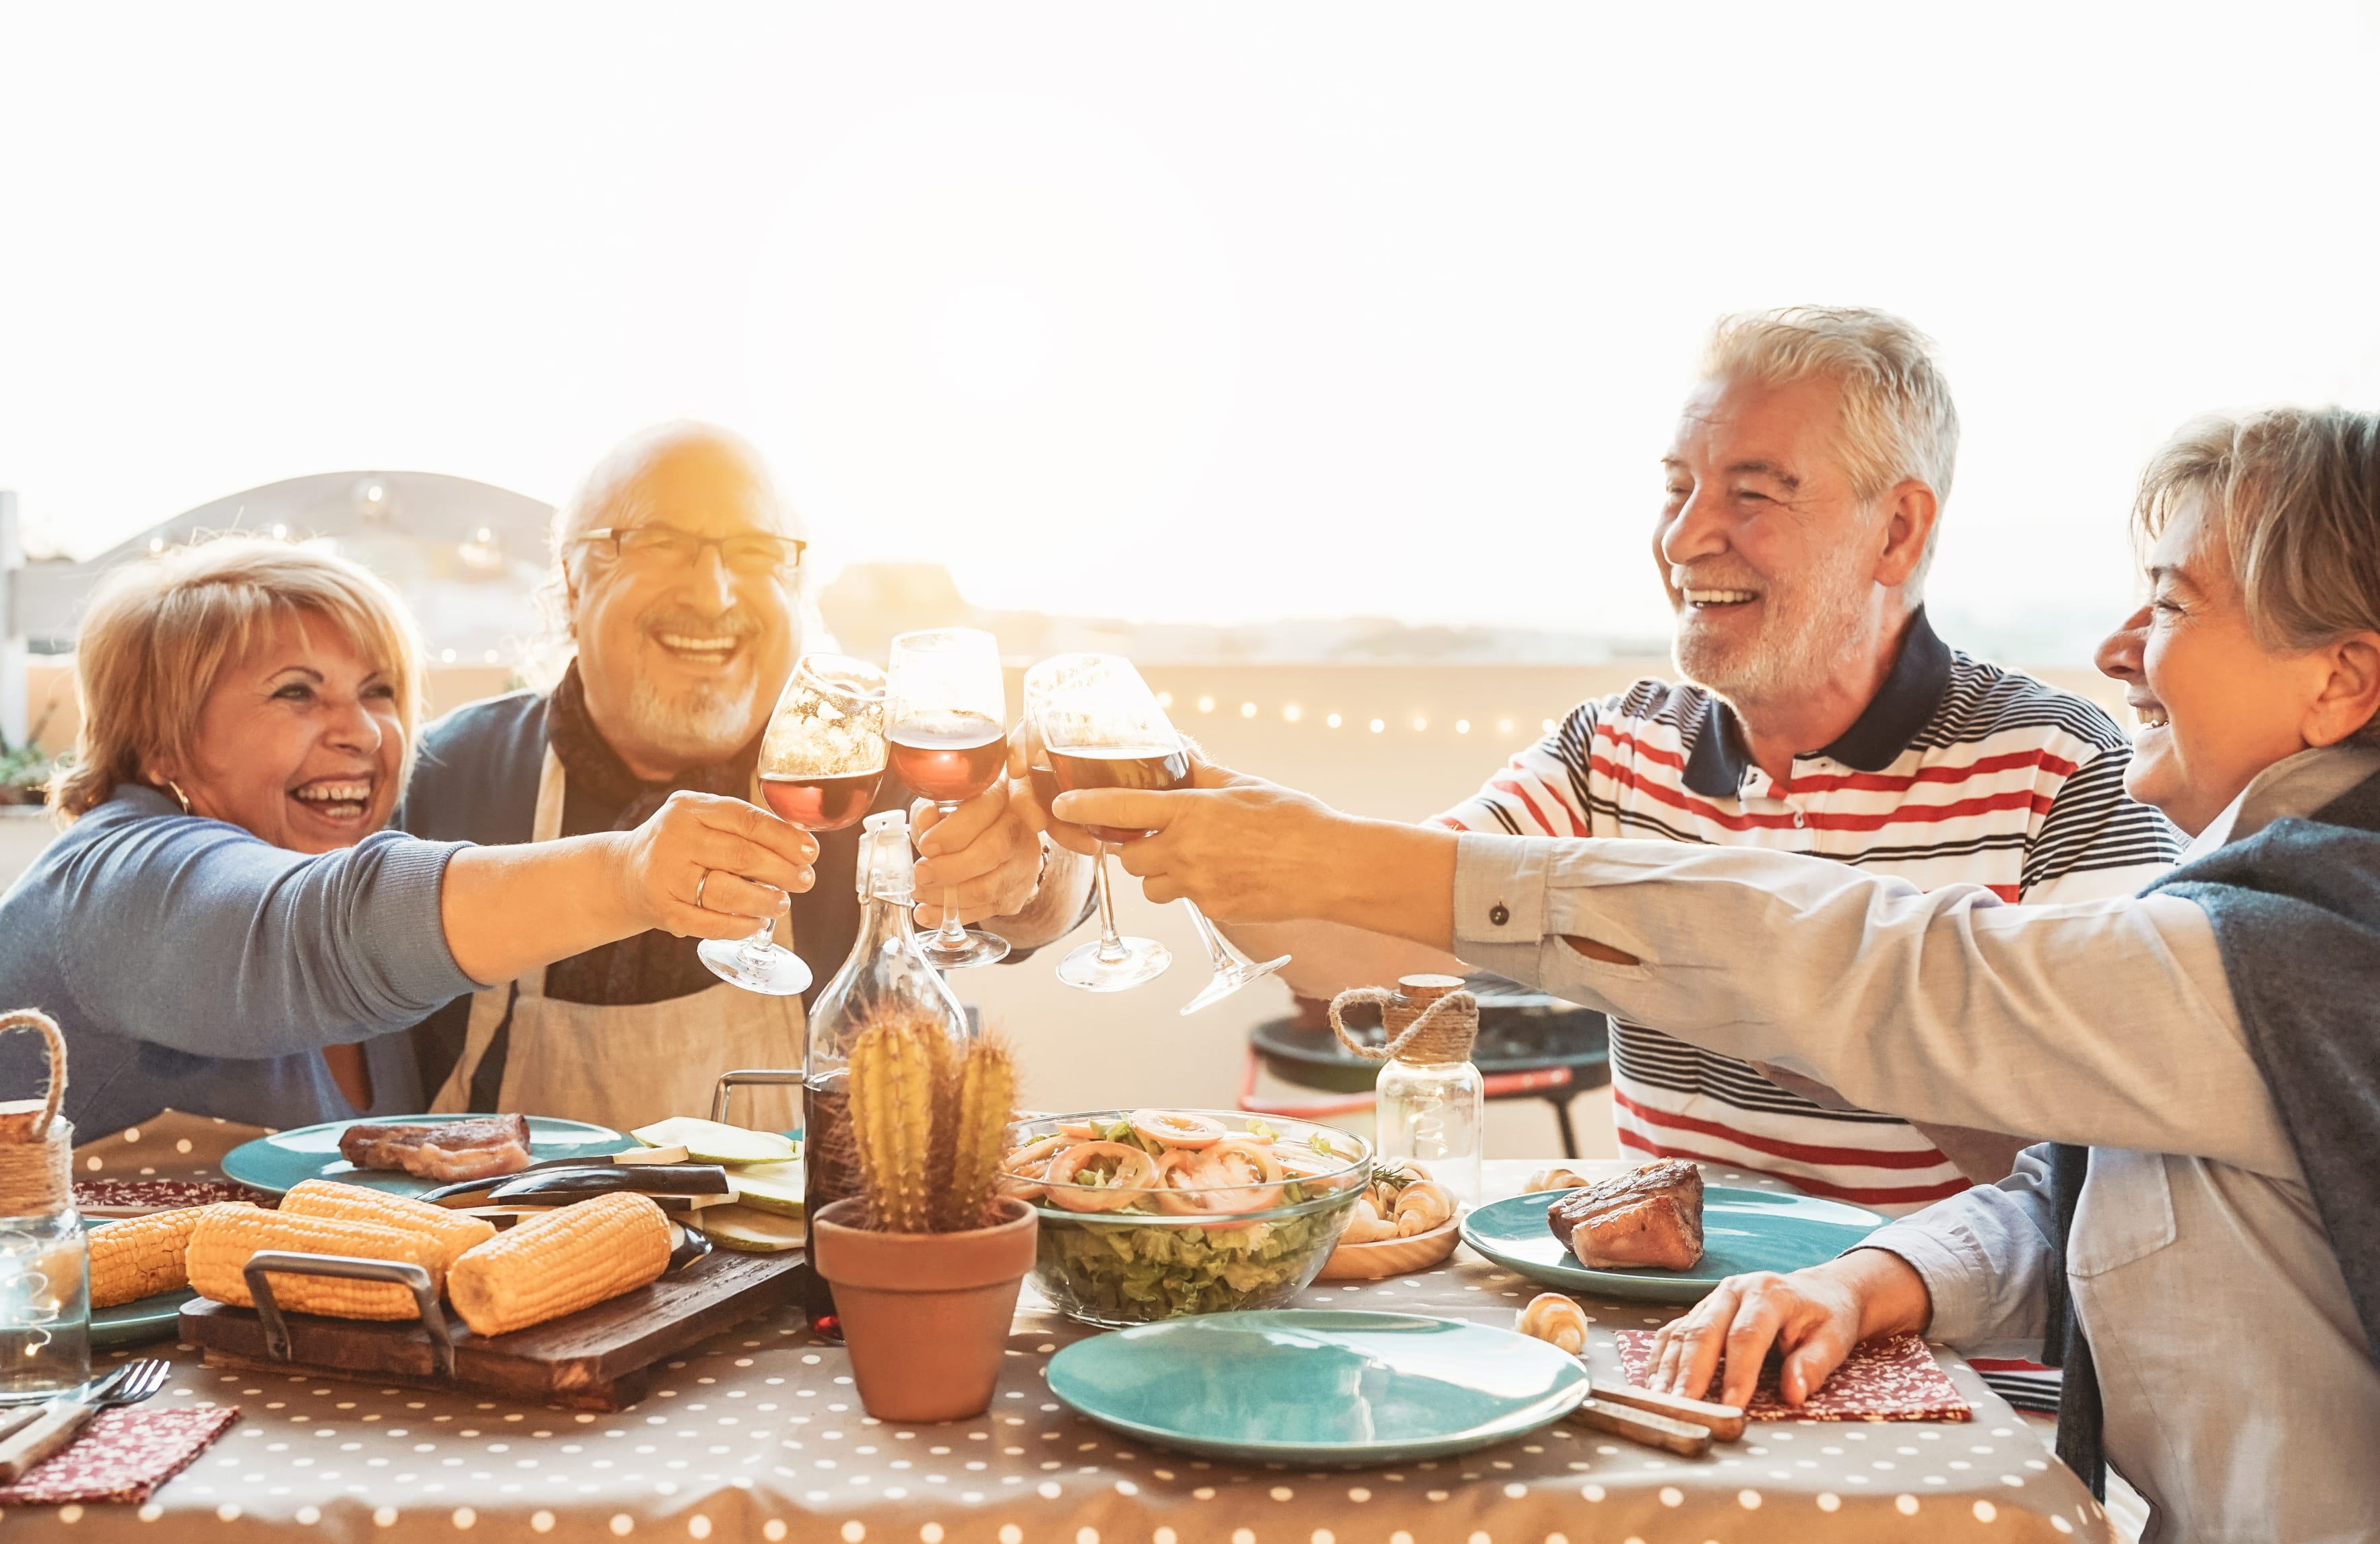 Seniors toasting, eating outside together